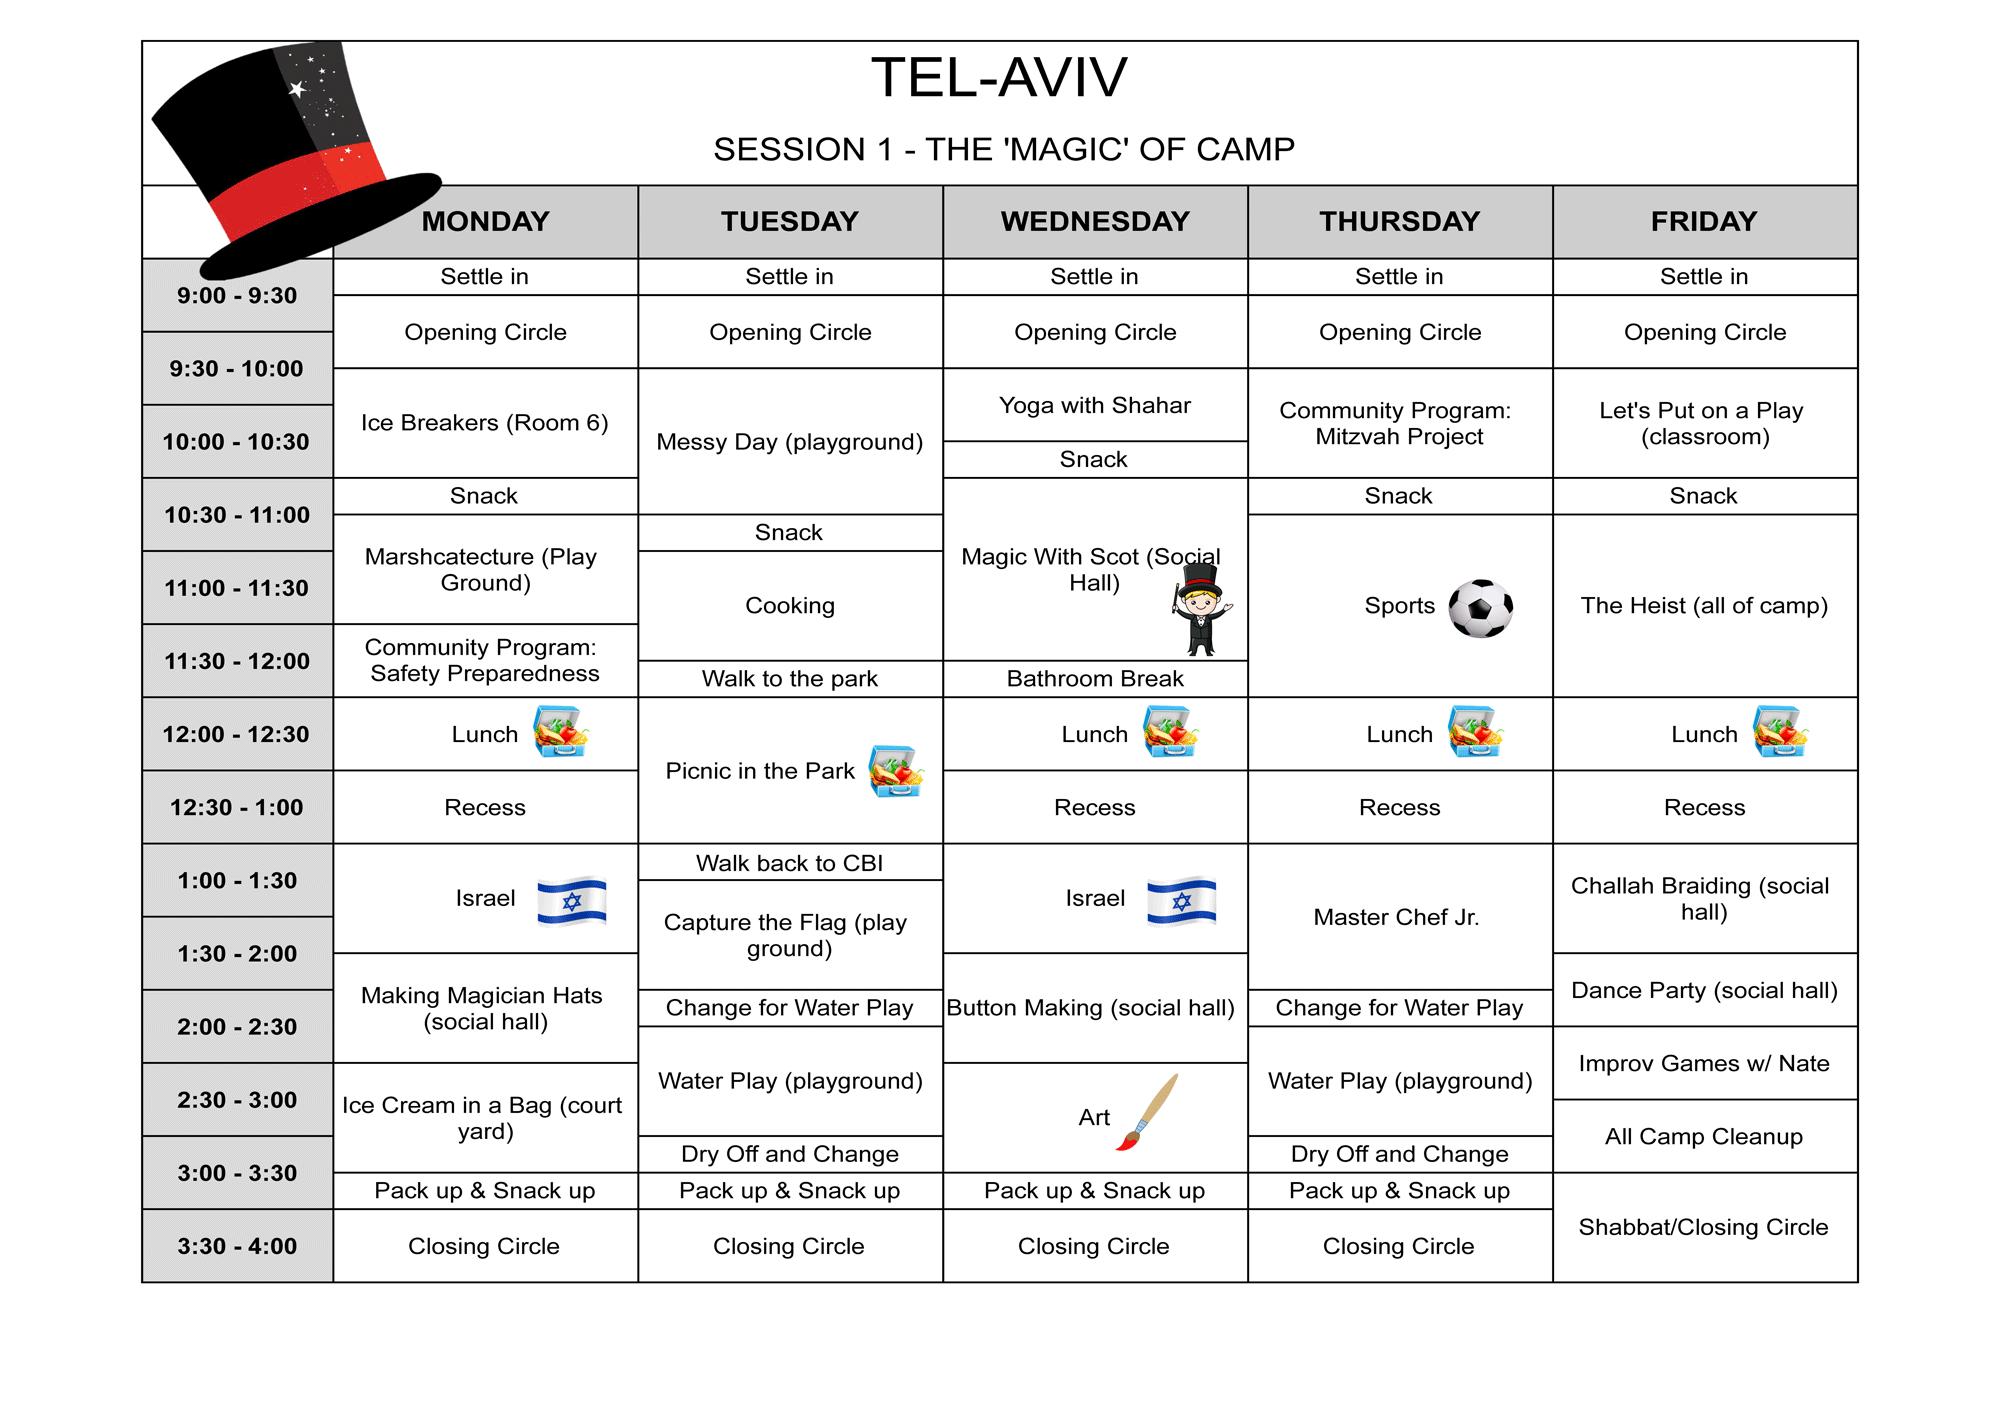 Sample Schedule session 1 Tel-Aviv